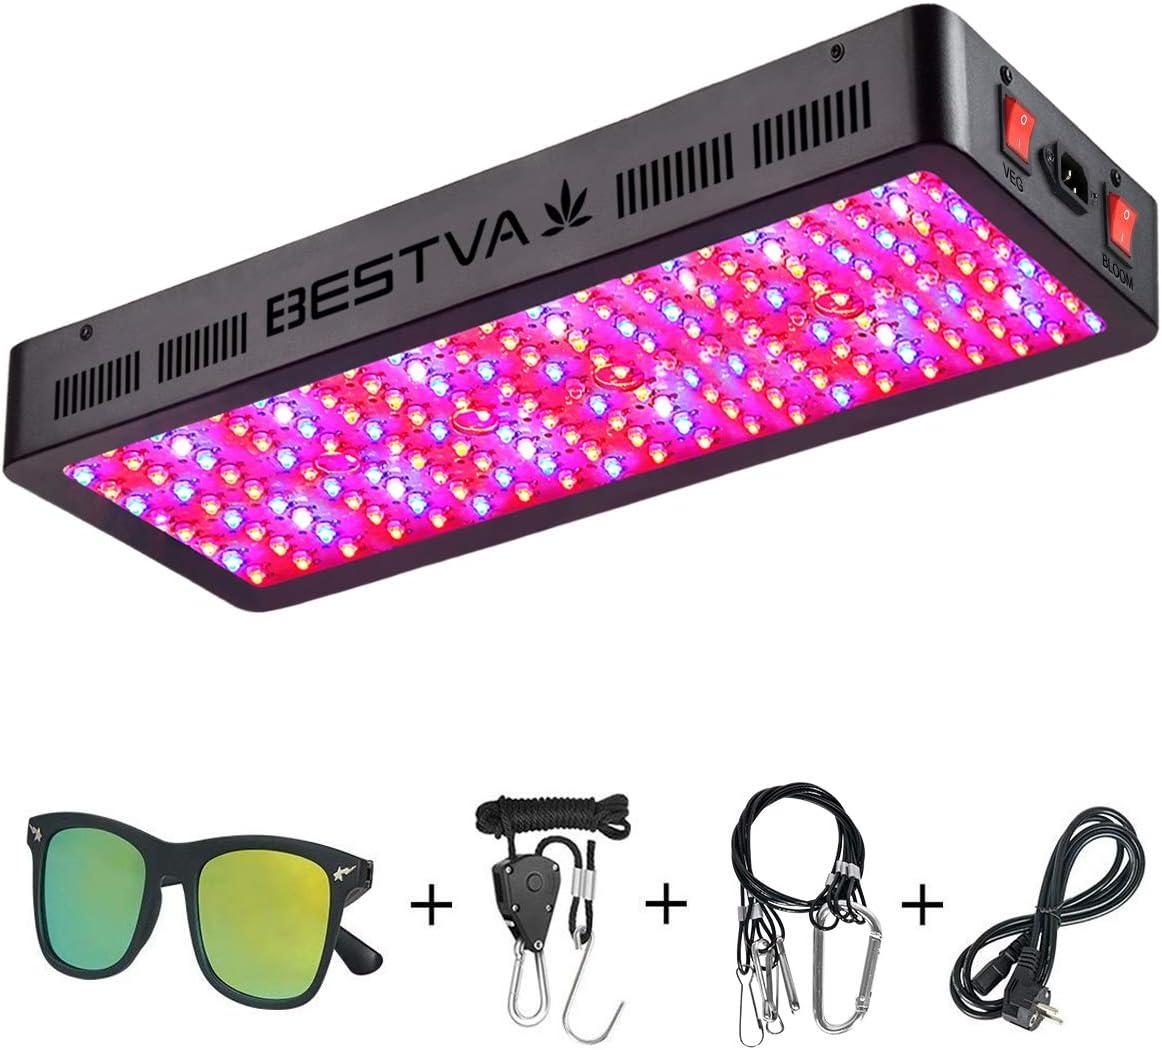 BESTVA DC Series 2000W LED Grow Light Full Spectrum for Hydroponic Plants